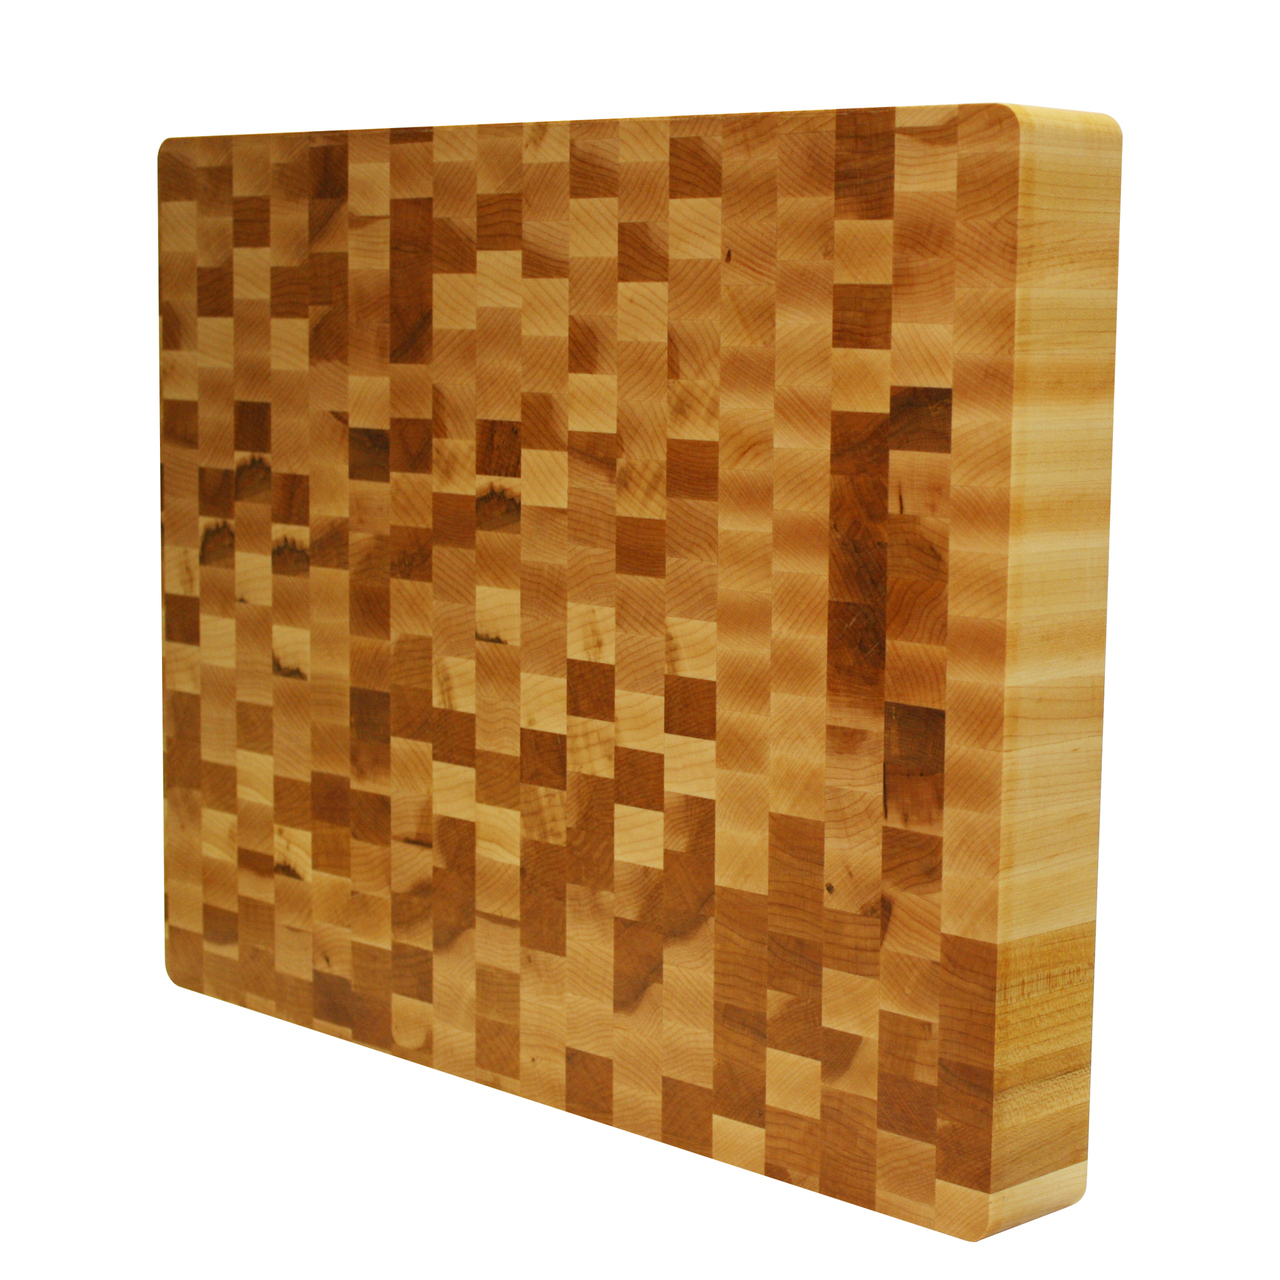 End Grain Boards